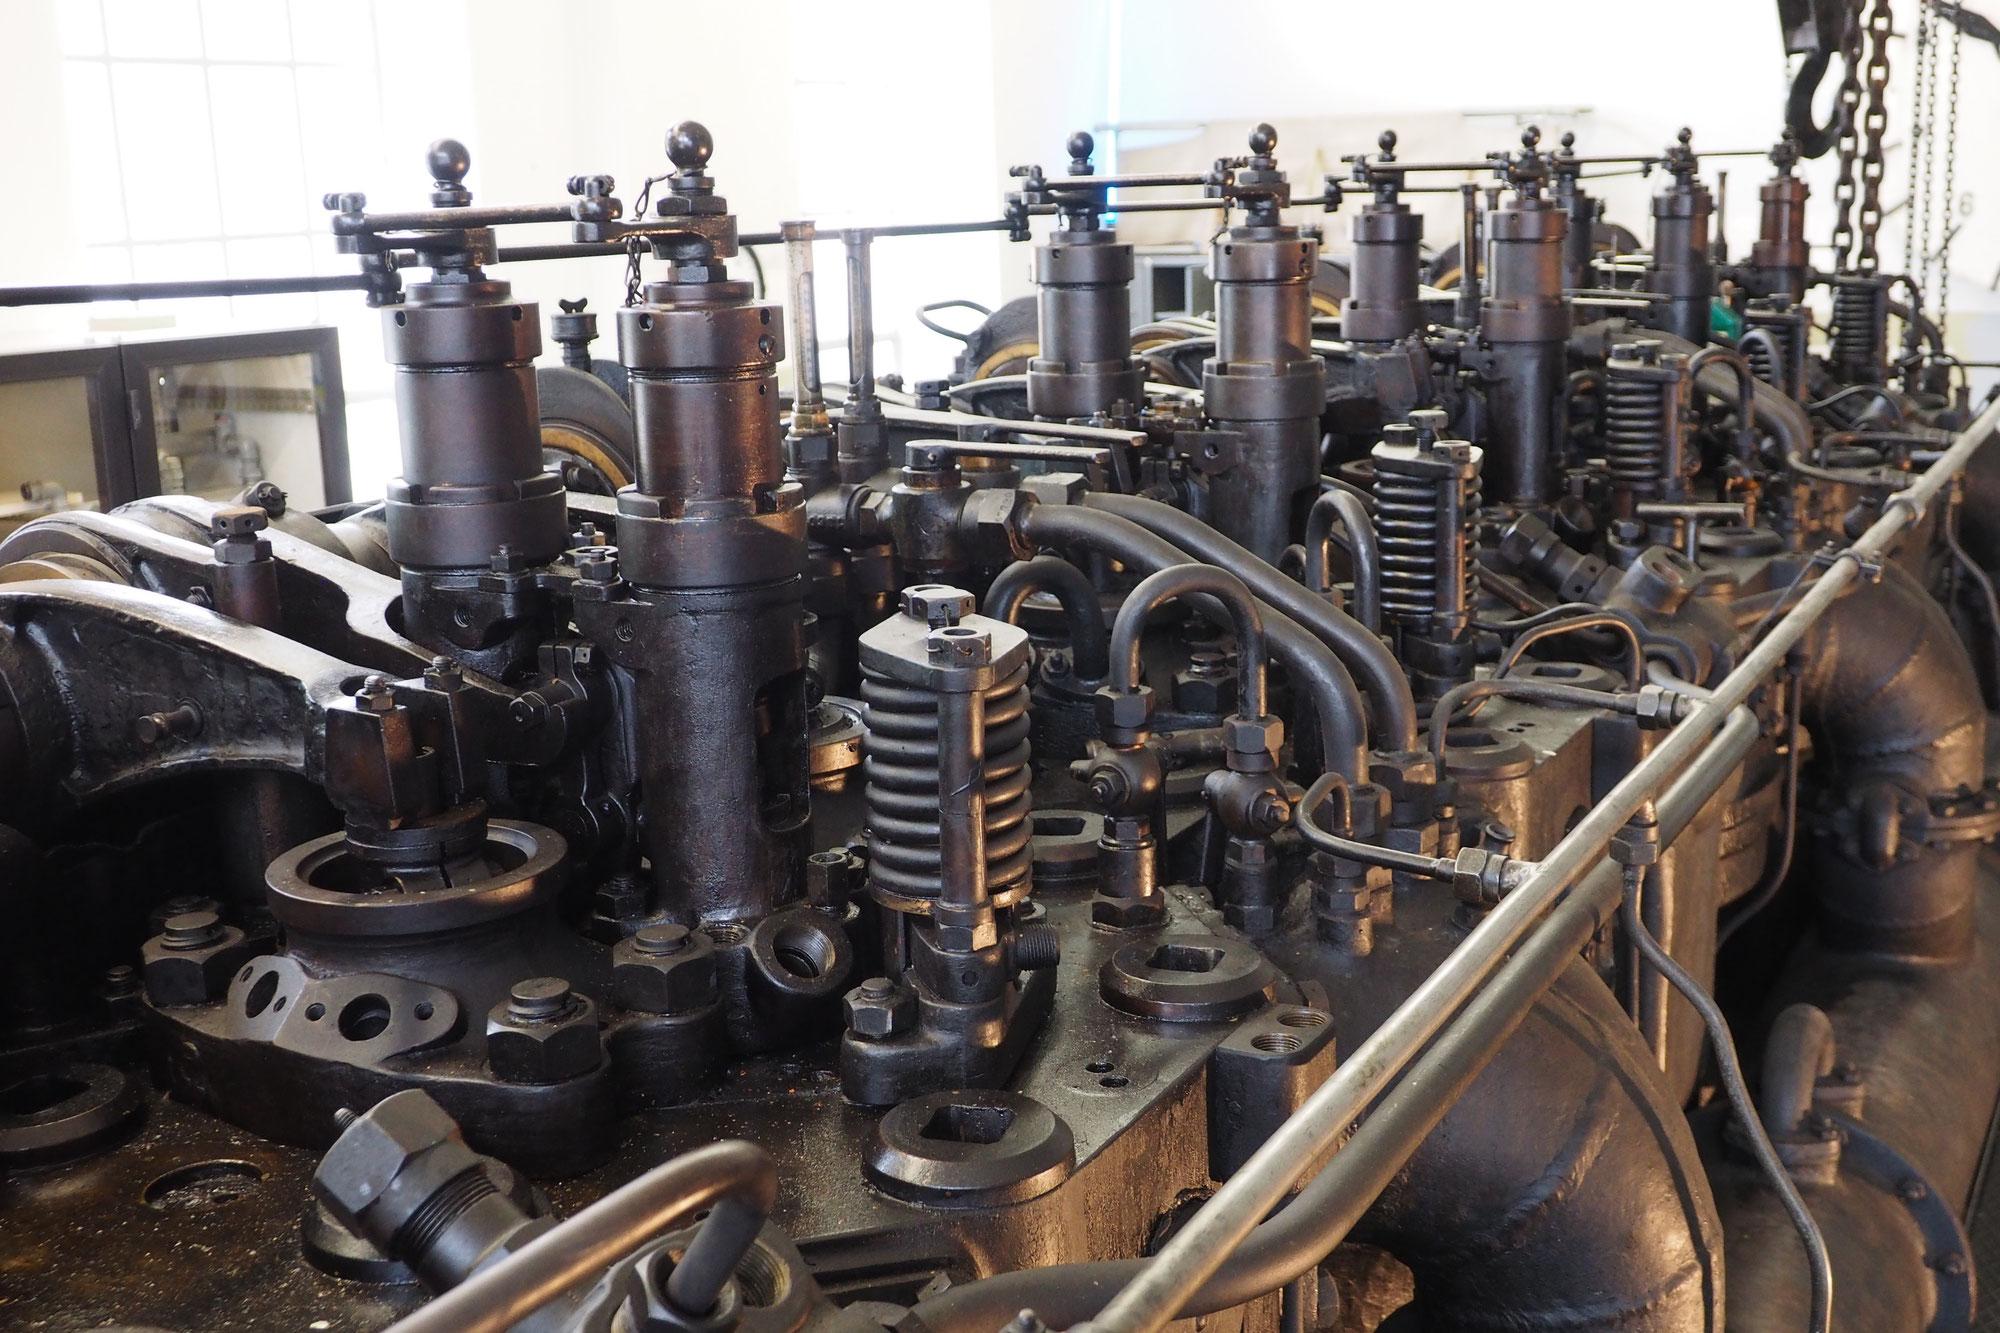 Dieselmotoren-Historikforschung - www.dieselmotoren-historik.com ...